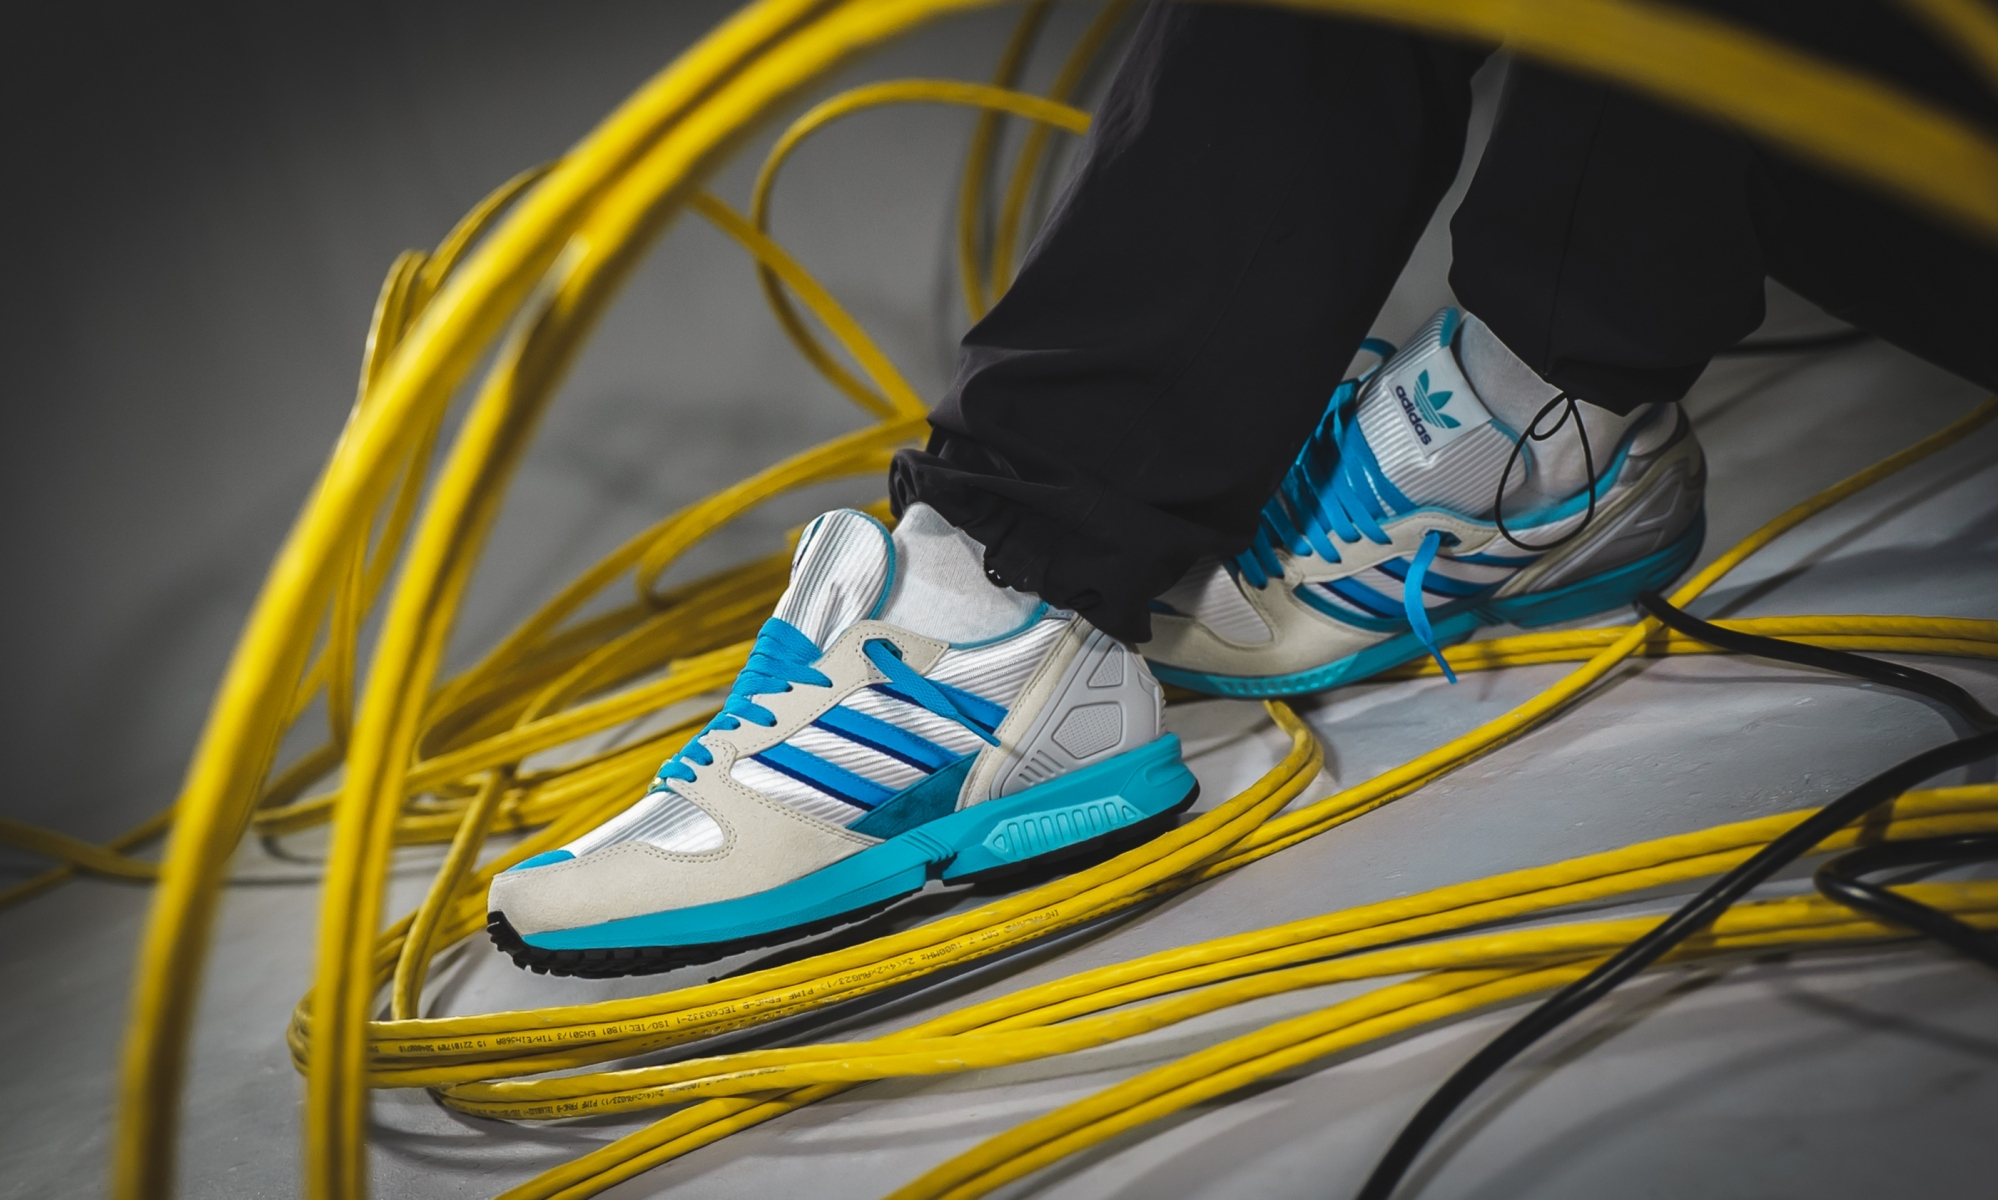 Adidas ZX 5000 OG '30th Anniversary